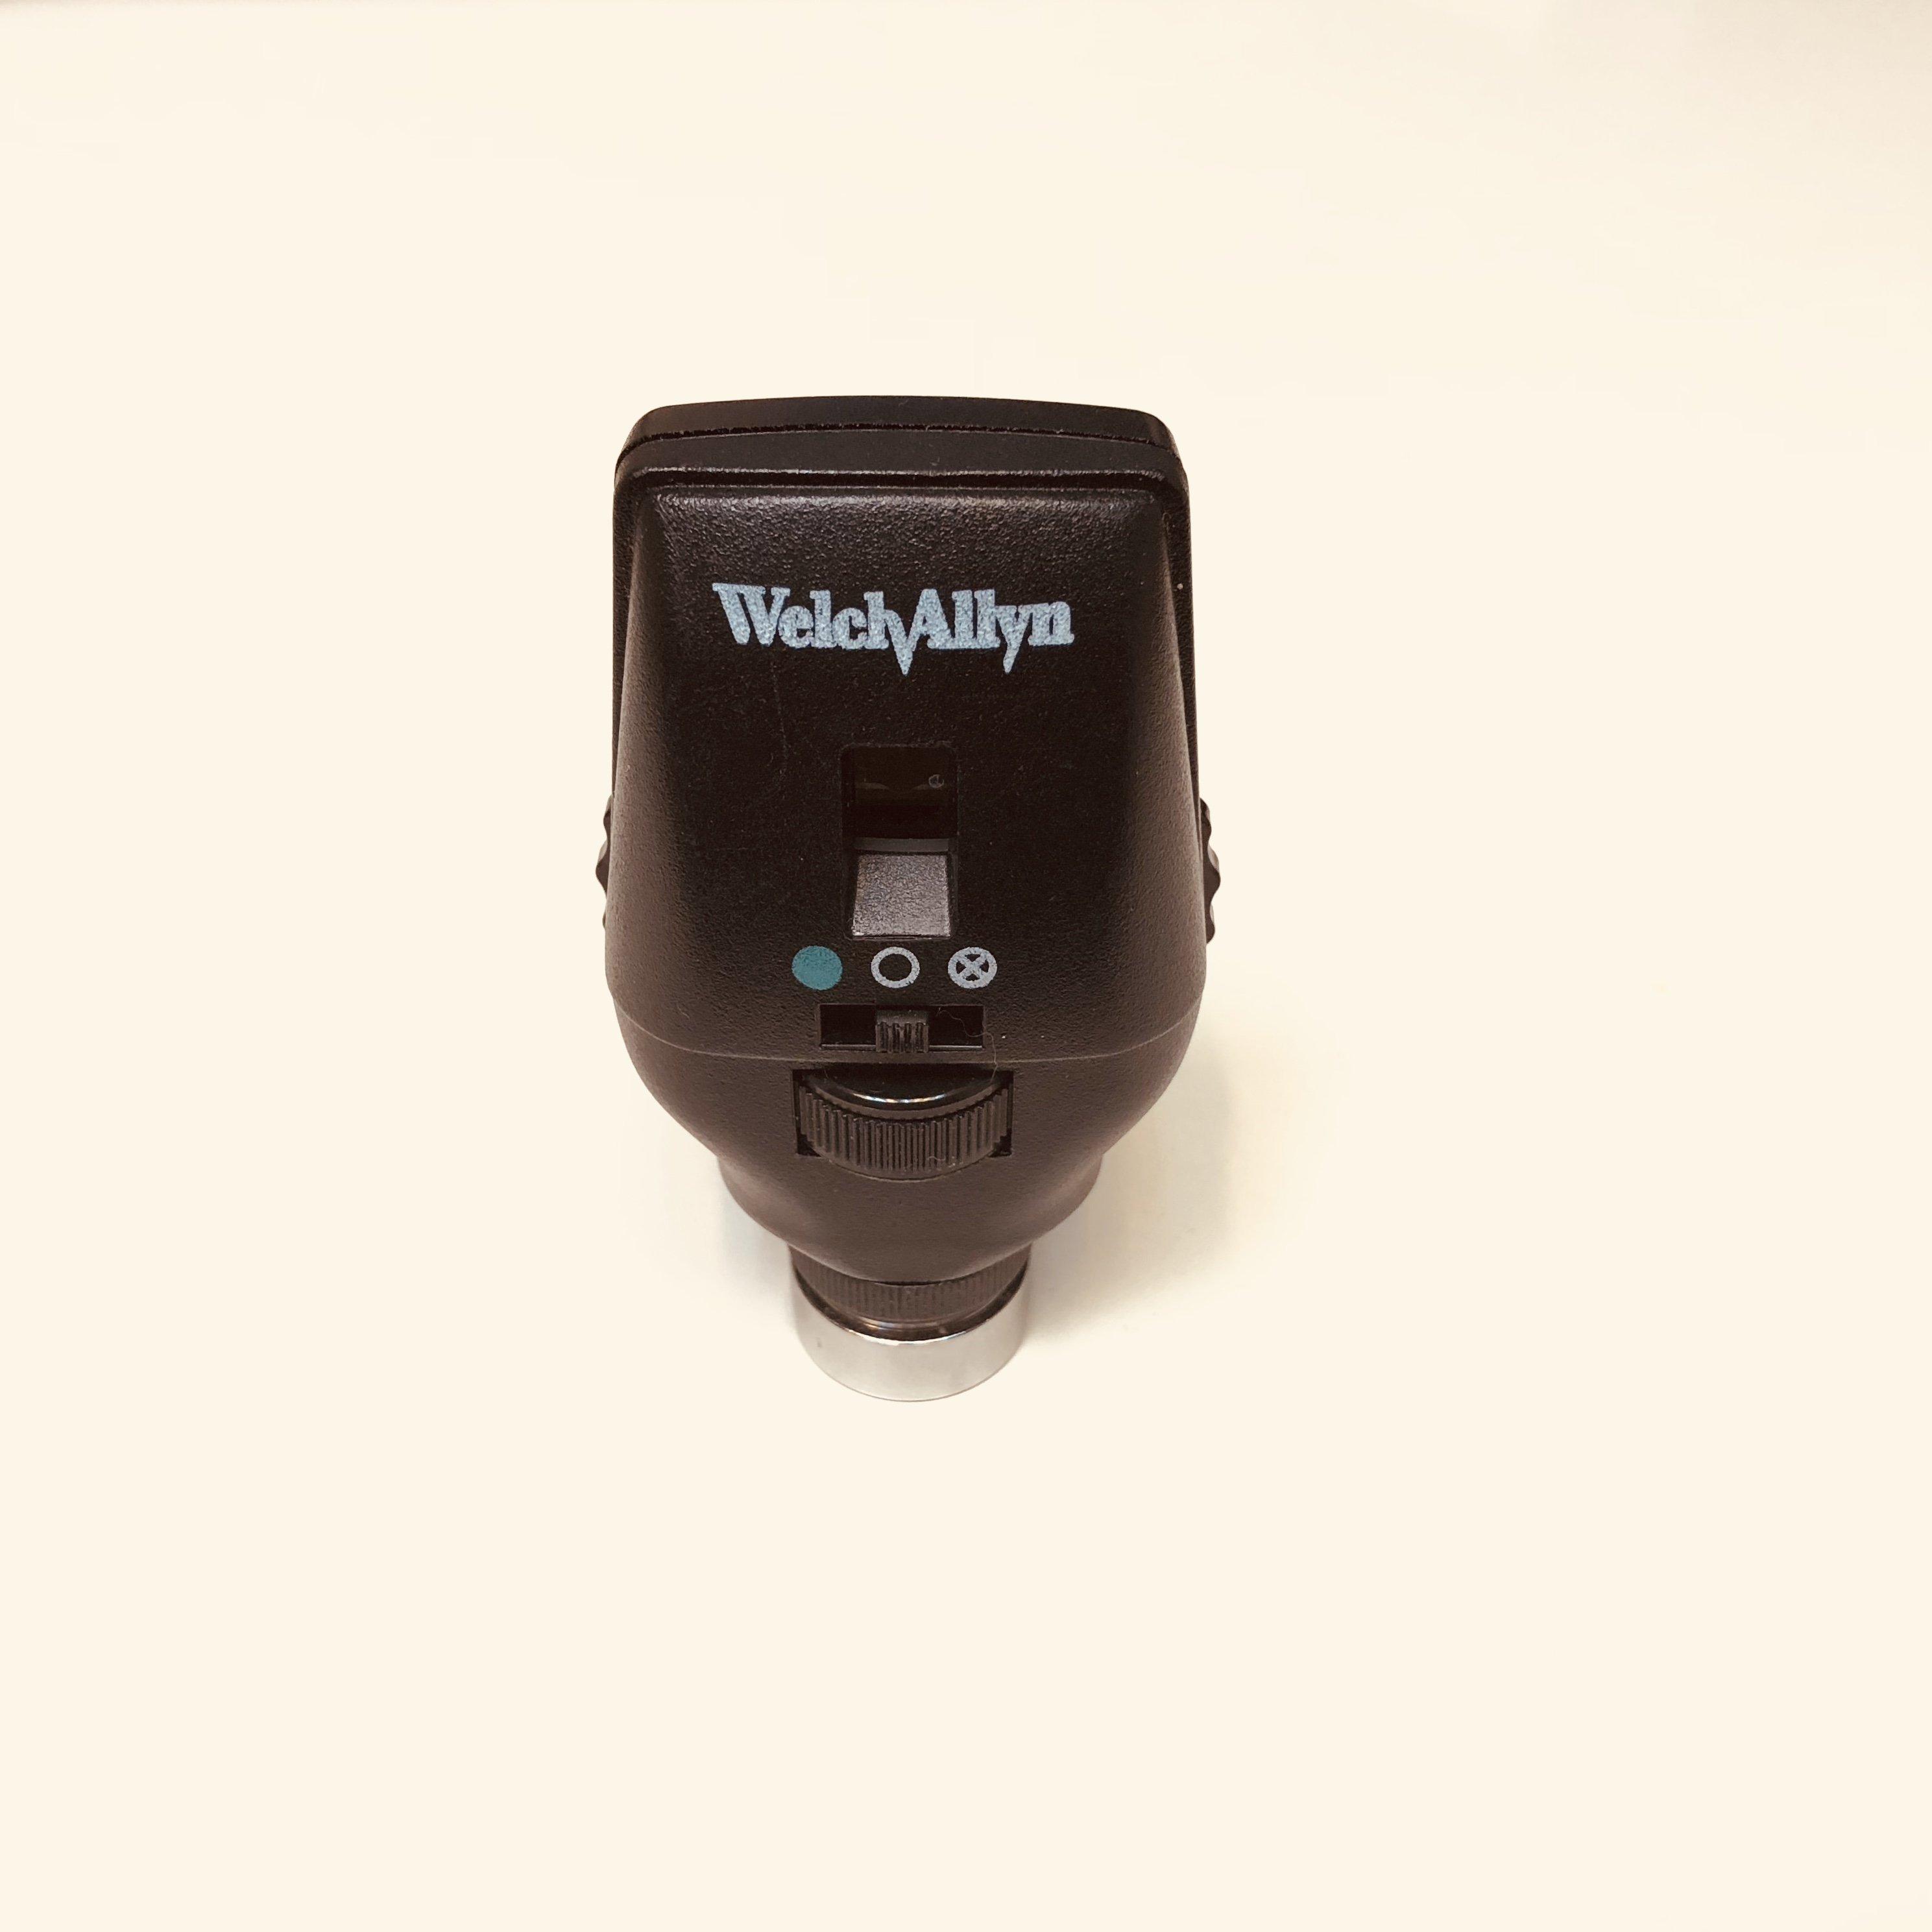 WelchAllyn 眼科檢查鏡